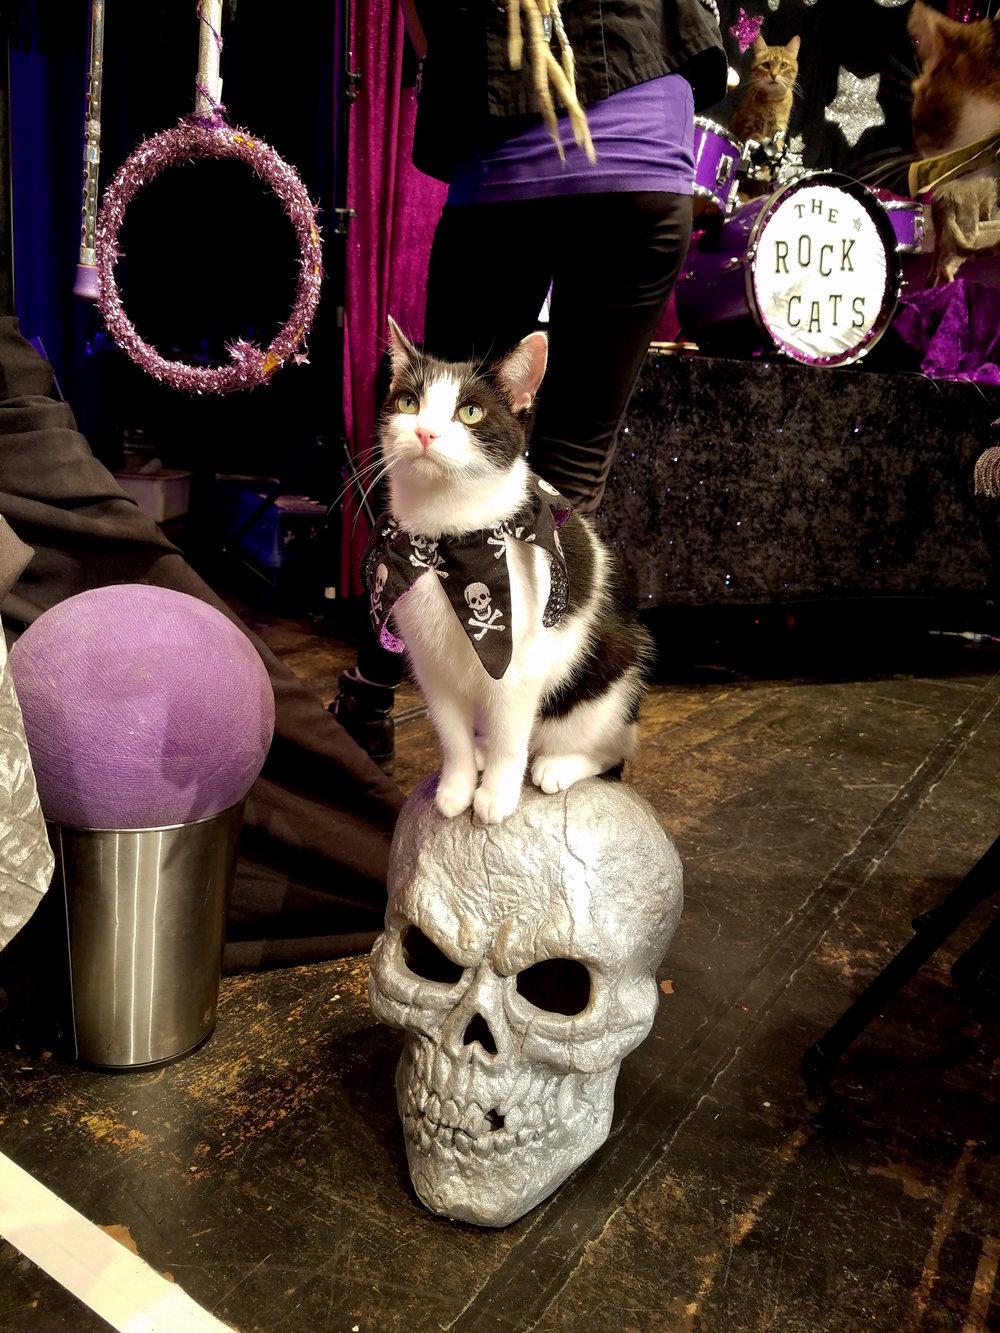 Jax on her skull.